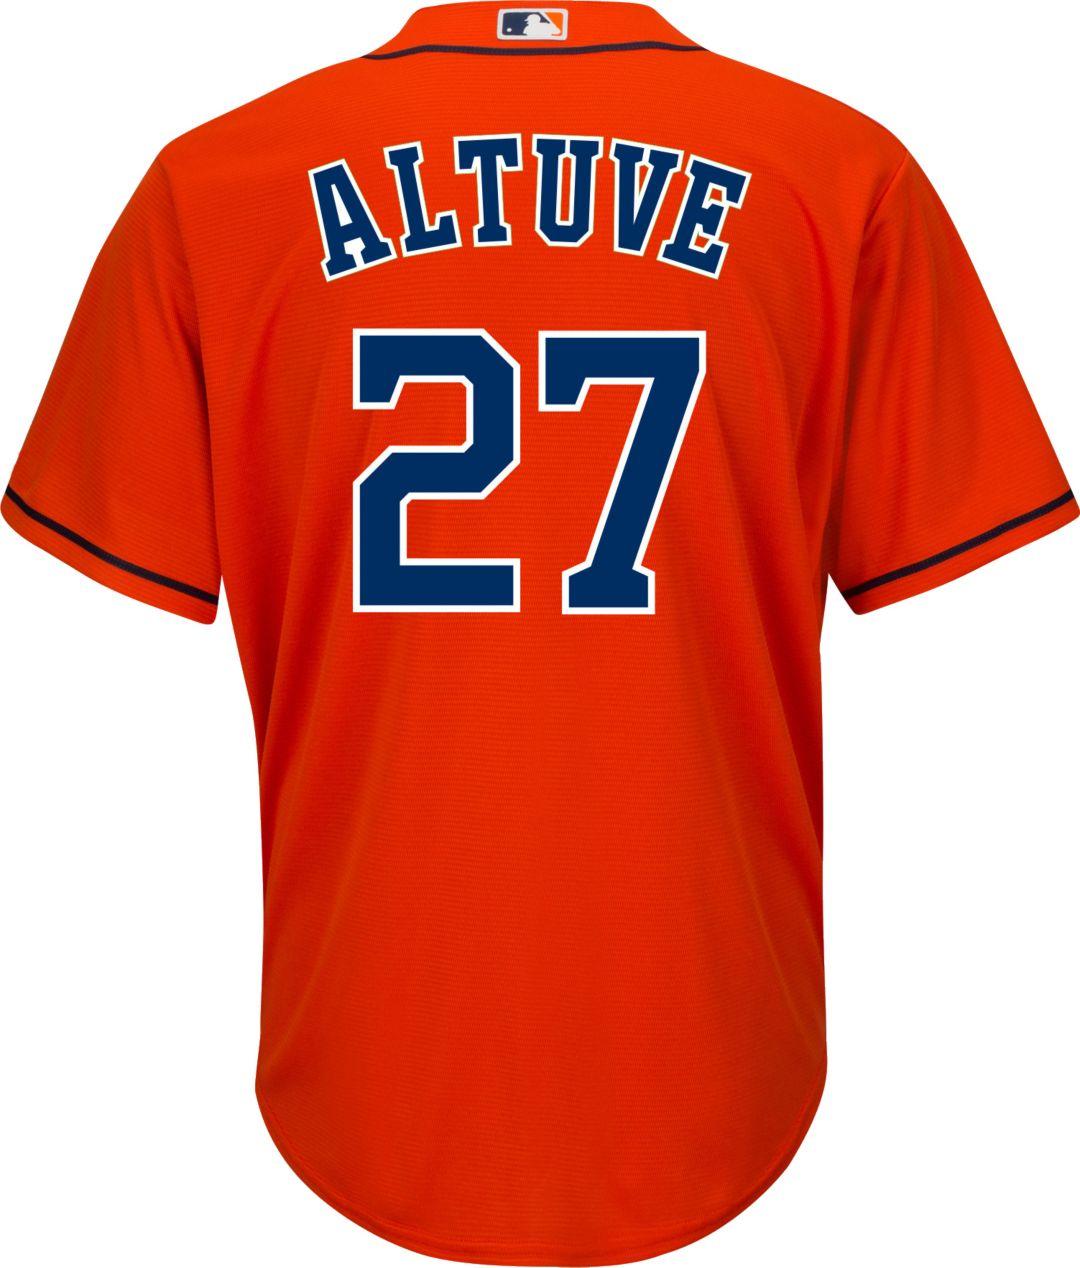 sale retailer e654b 89be6 Youth Replica Houston Astros Jose Altuve #27 Alternate Orange Jersey